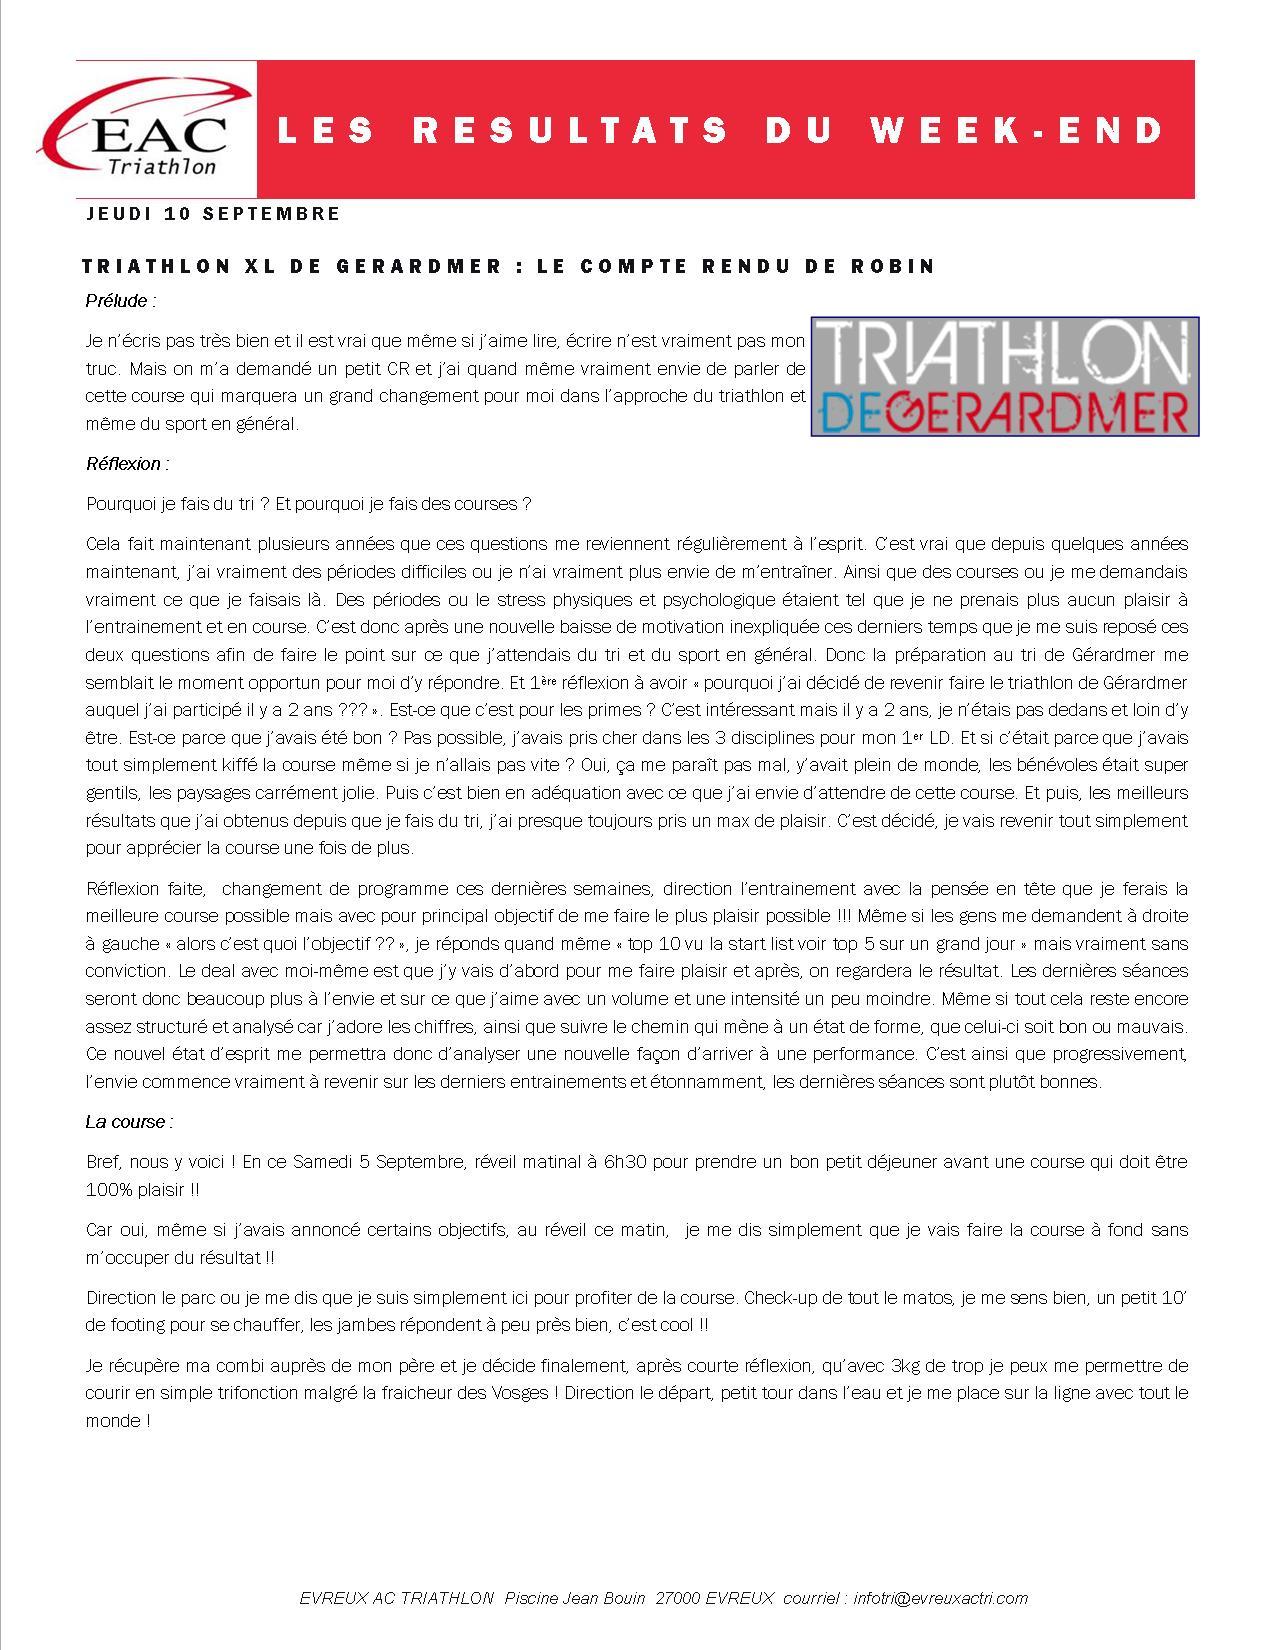 2015 09 05 gerardmer impressions de robin p1